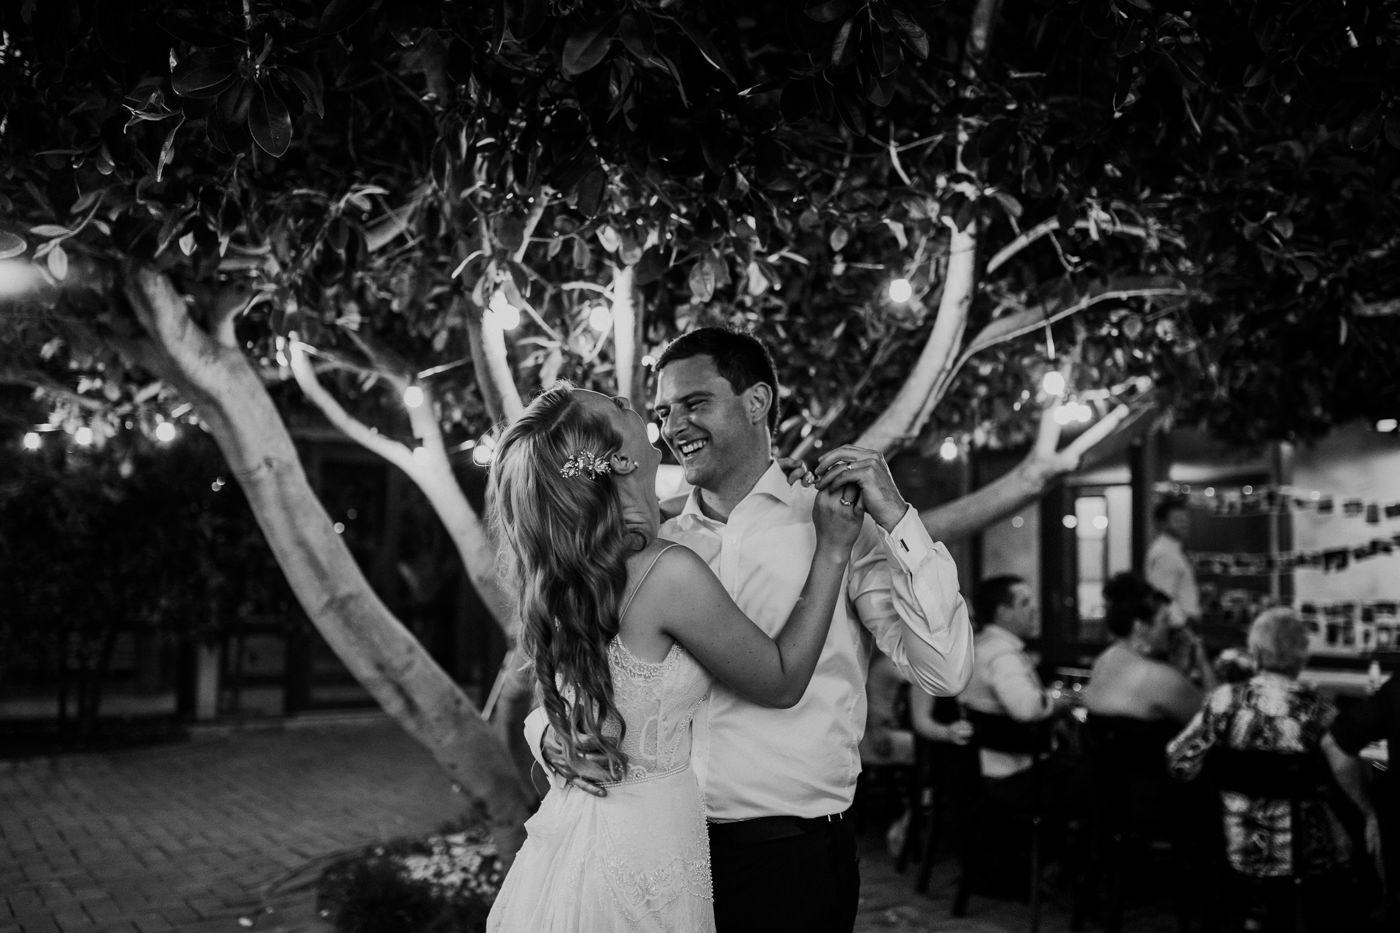 Anthony & Eliet - Wagga Wagga Wedding - Country NSW - Samantha Heather Photography-170.jpg